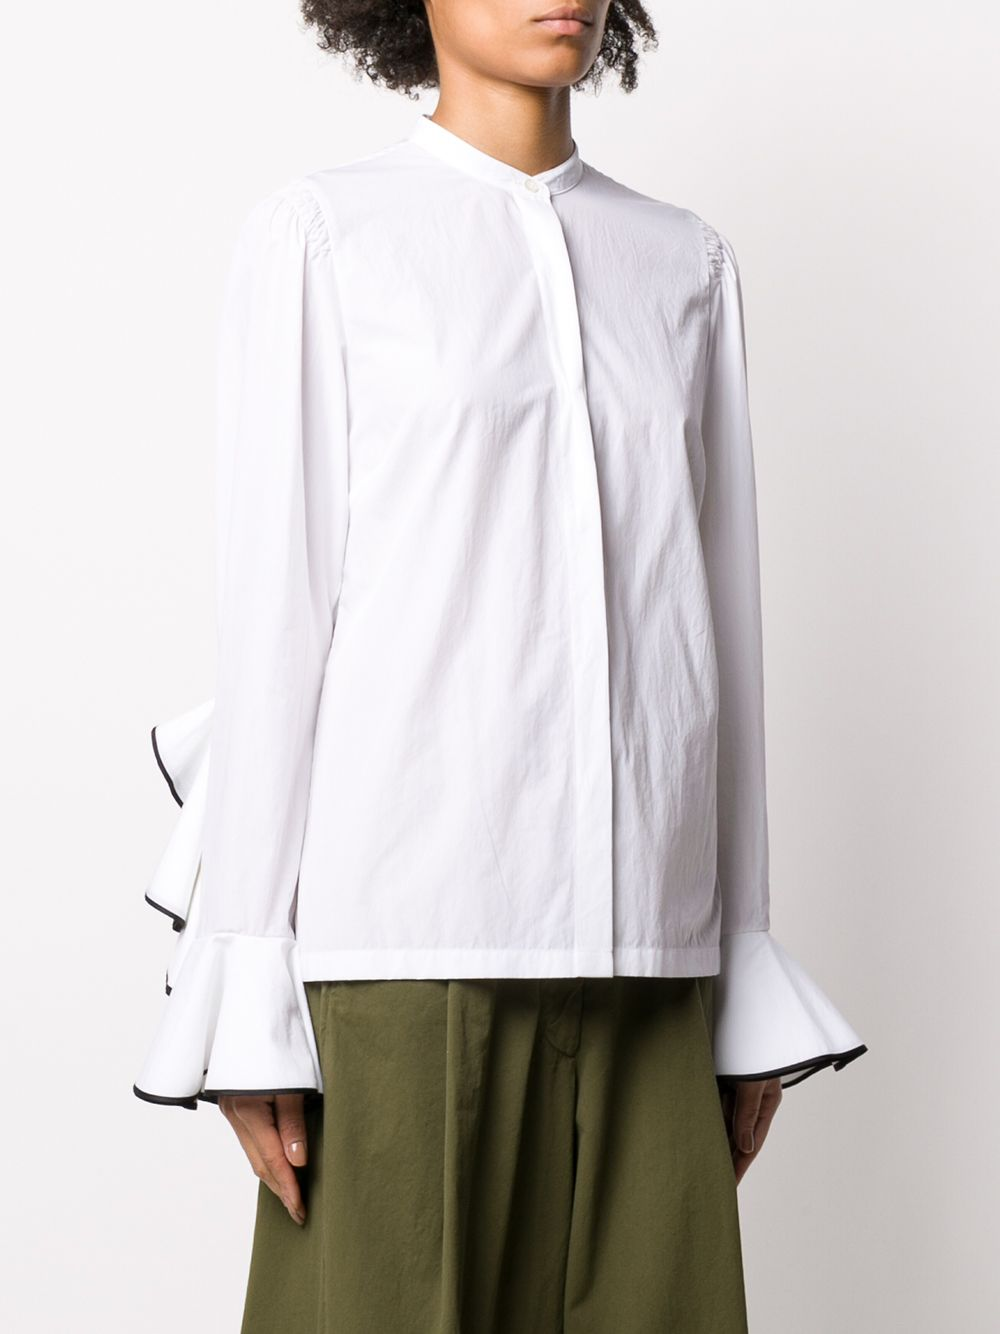 Calfur Shirt